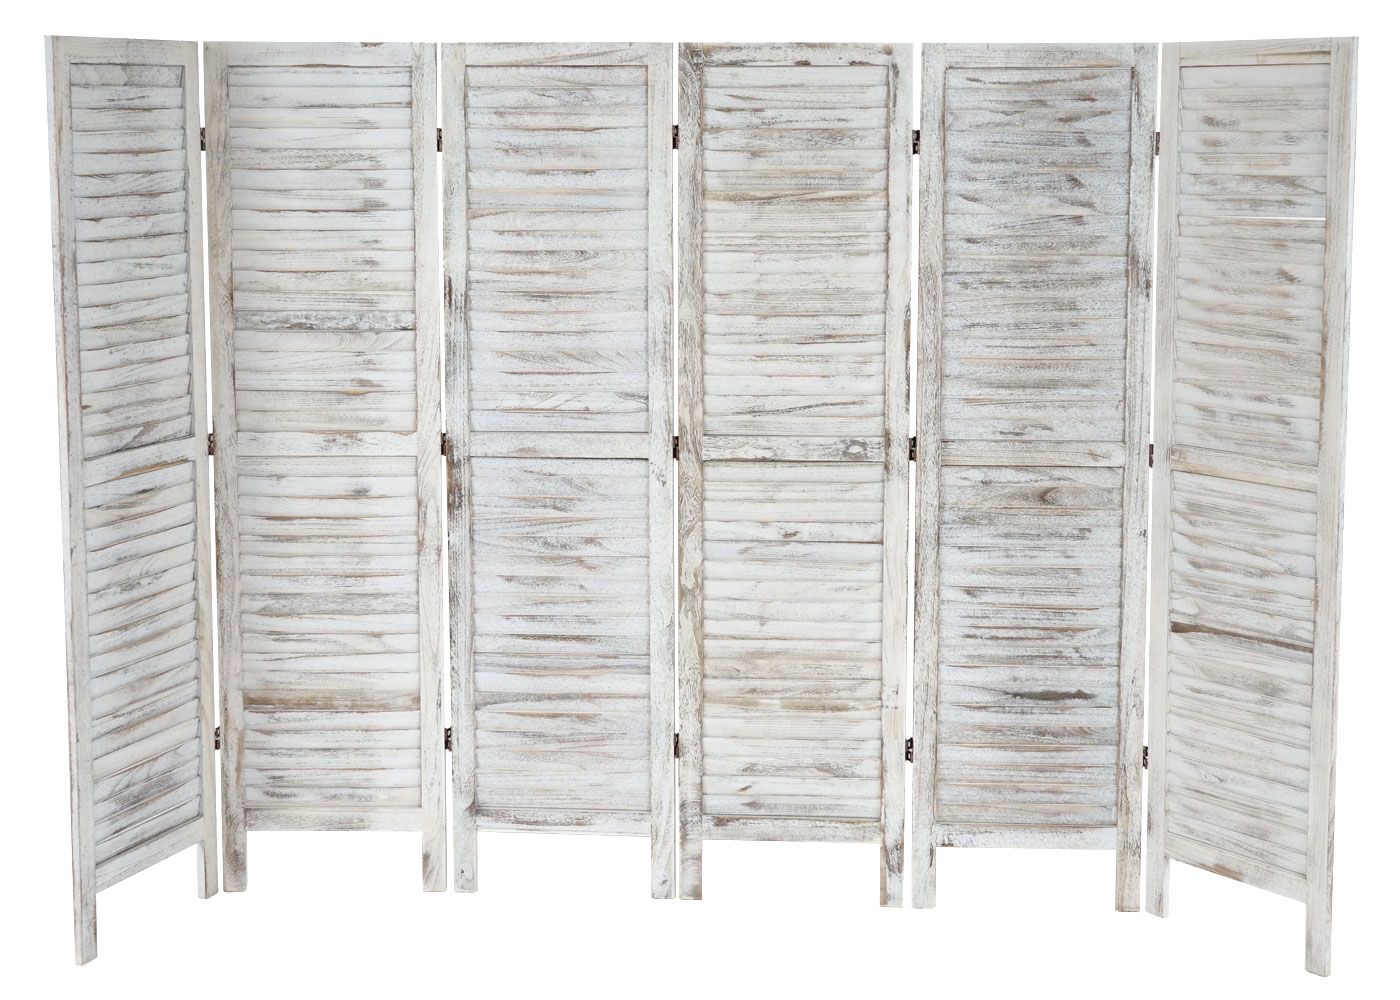 paravent raumteiler 170x276x2cm shabby look vintage wei. Black Bedroom Furniture Sets. Home Design Ideas